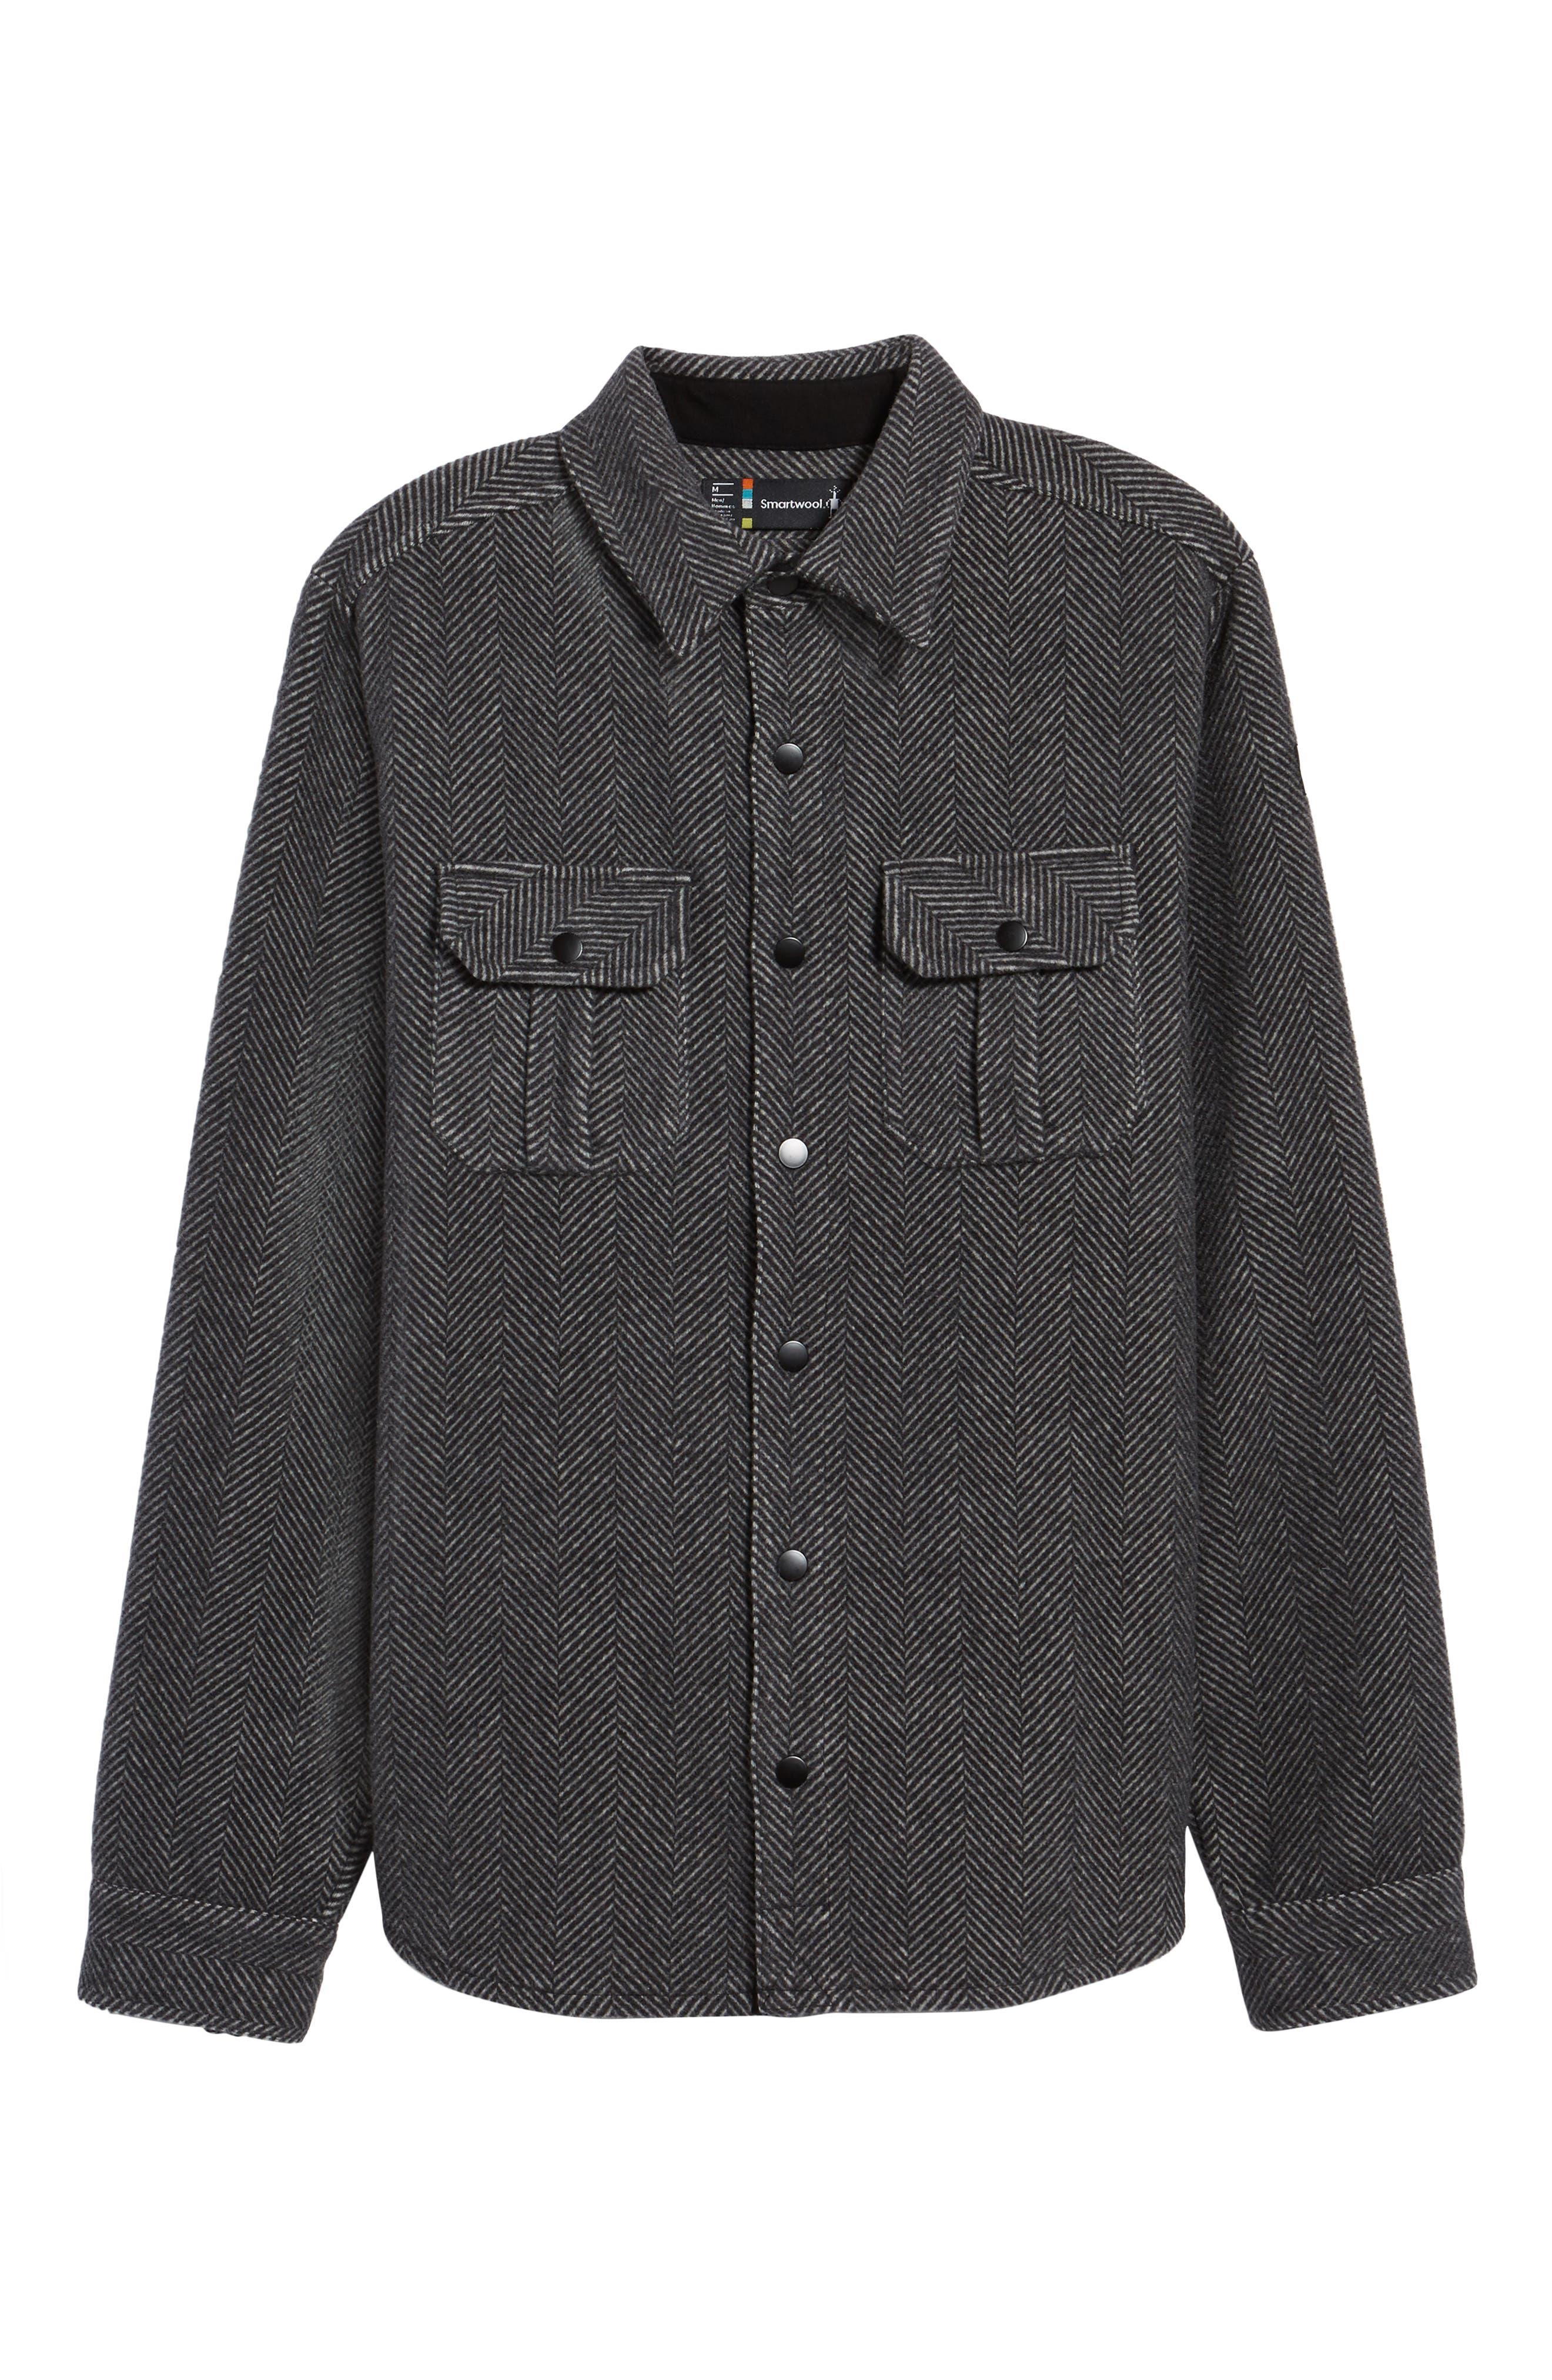 Anchor Line Herringbone Wool Blend Shirt Jacket,                             Alternate thumbnail 6, color,                             Charcoal Heather